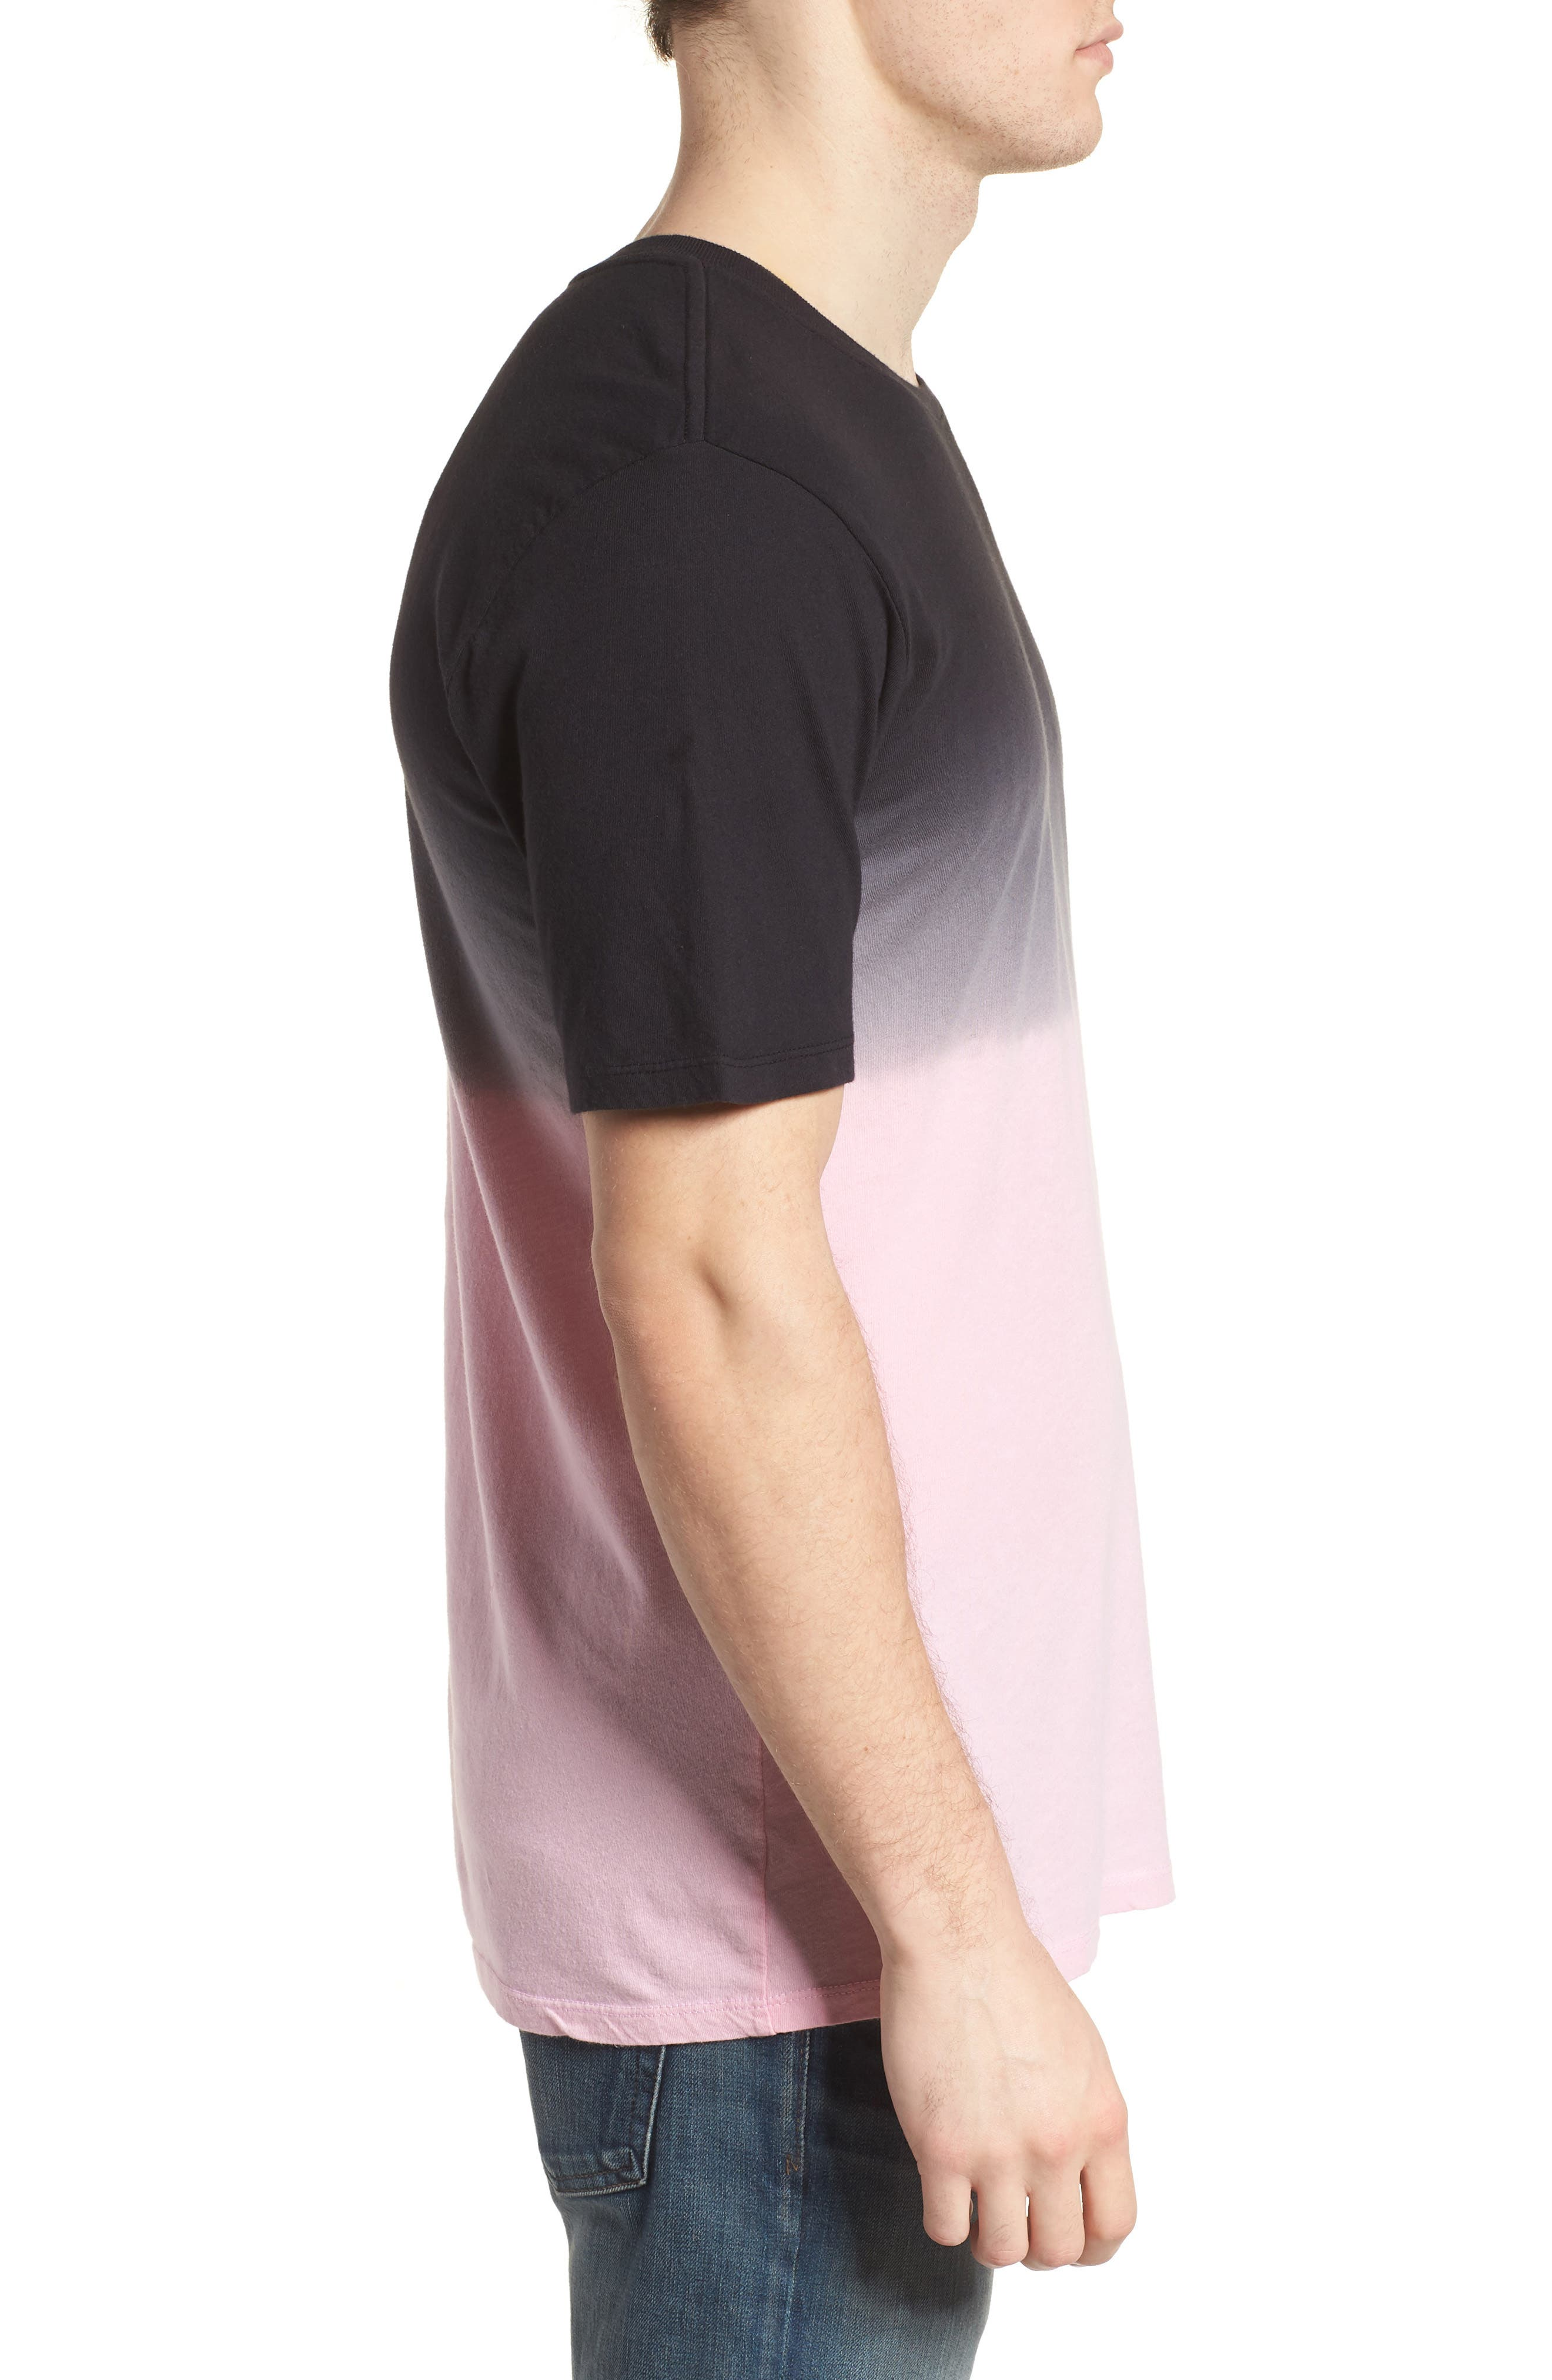 Trajectory Dip Dye T-Shirt,                             Alternate thumbnail 3, color,                             Hyper Pink/Black